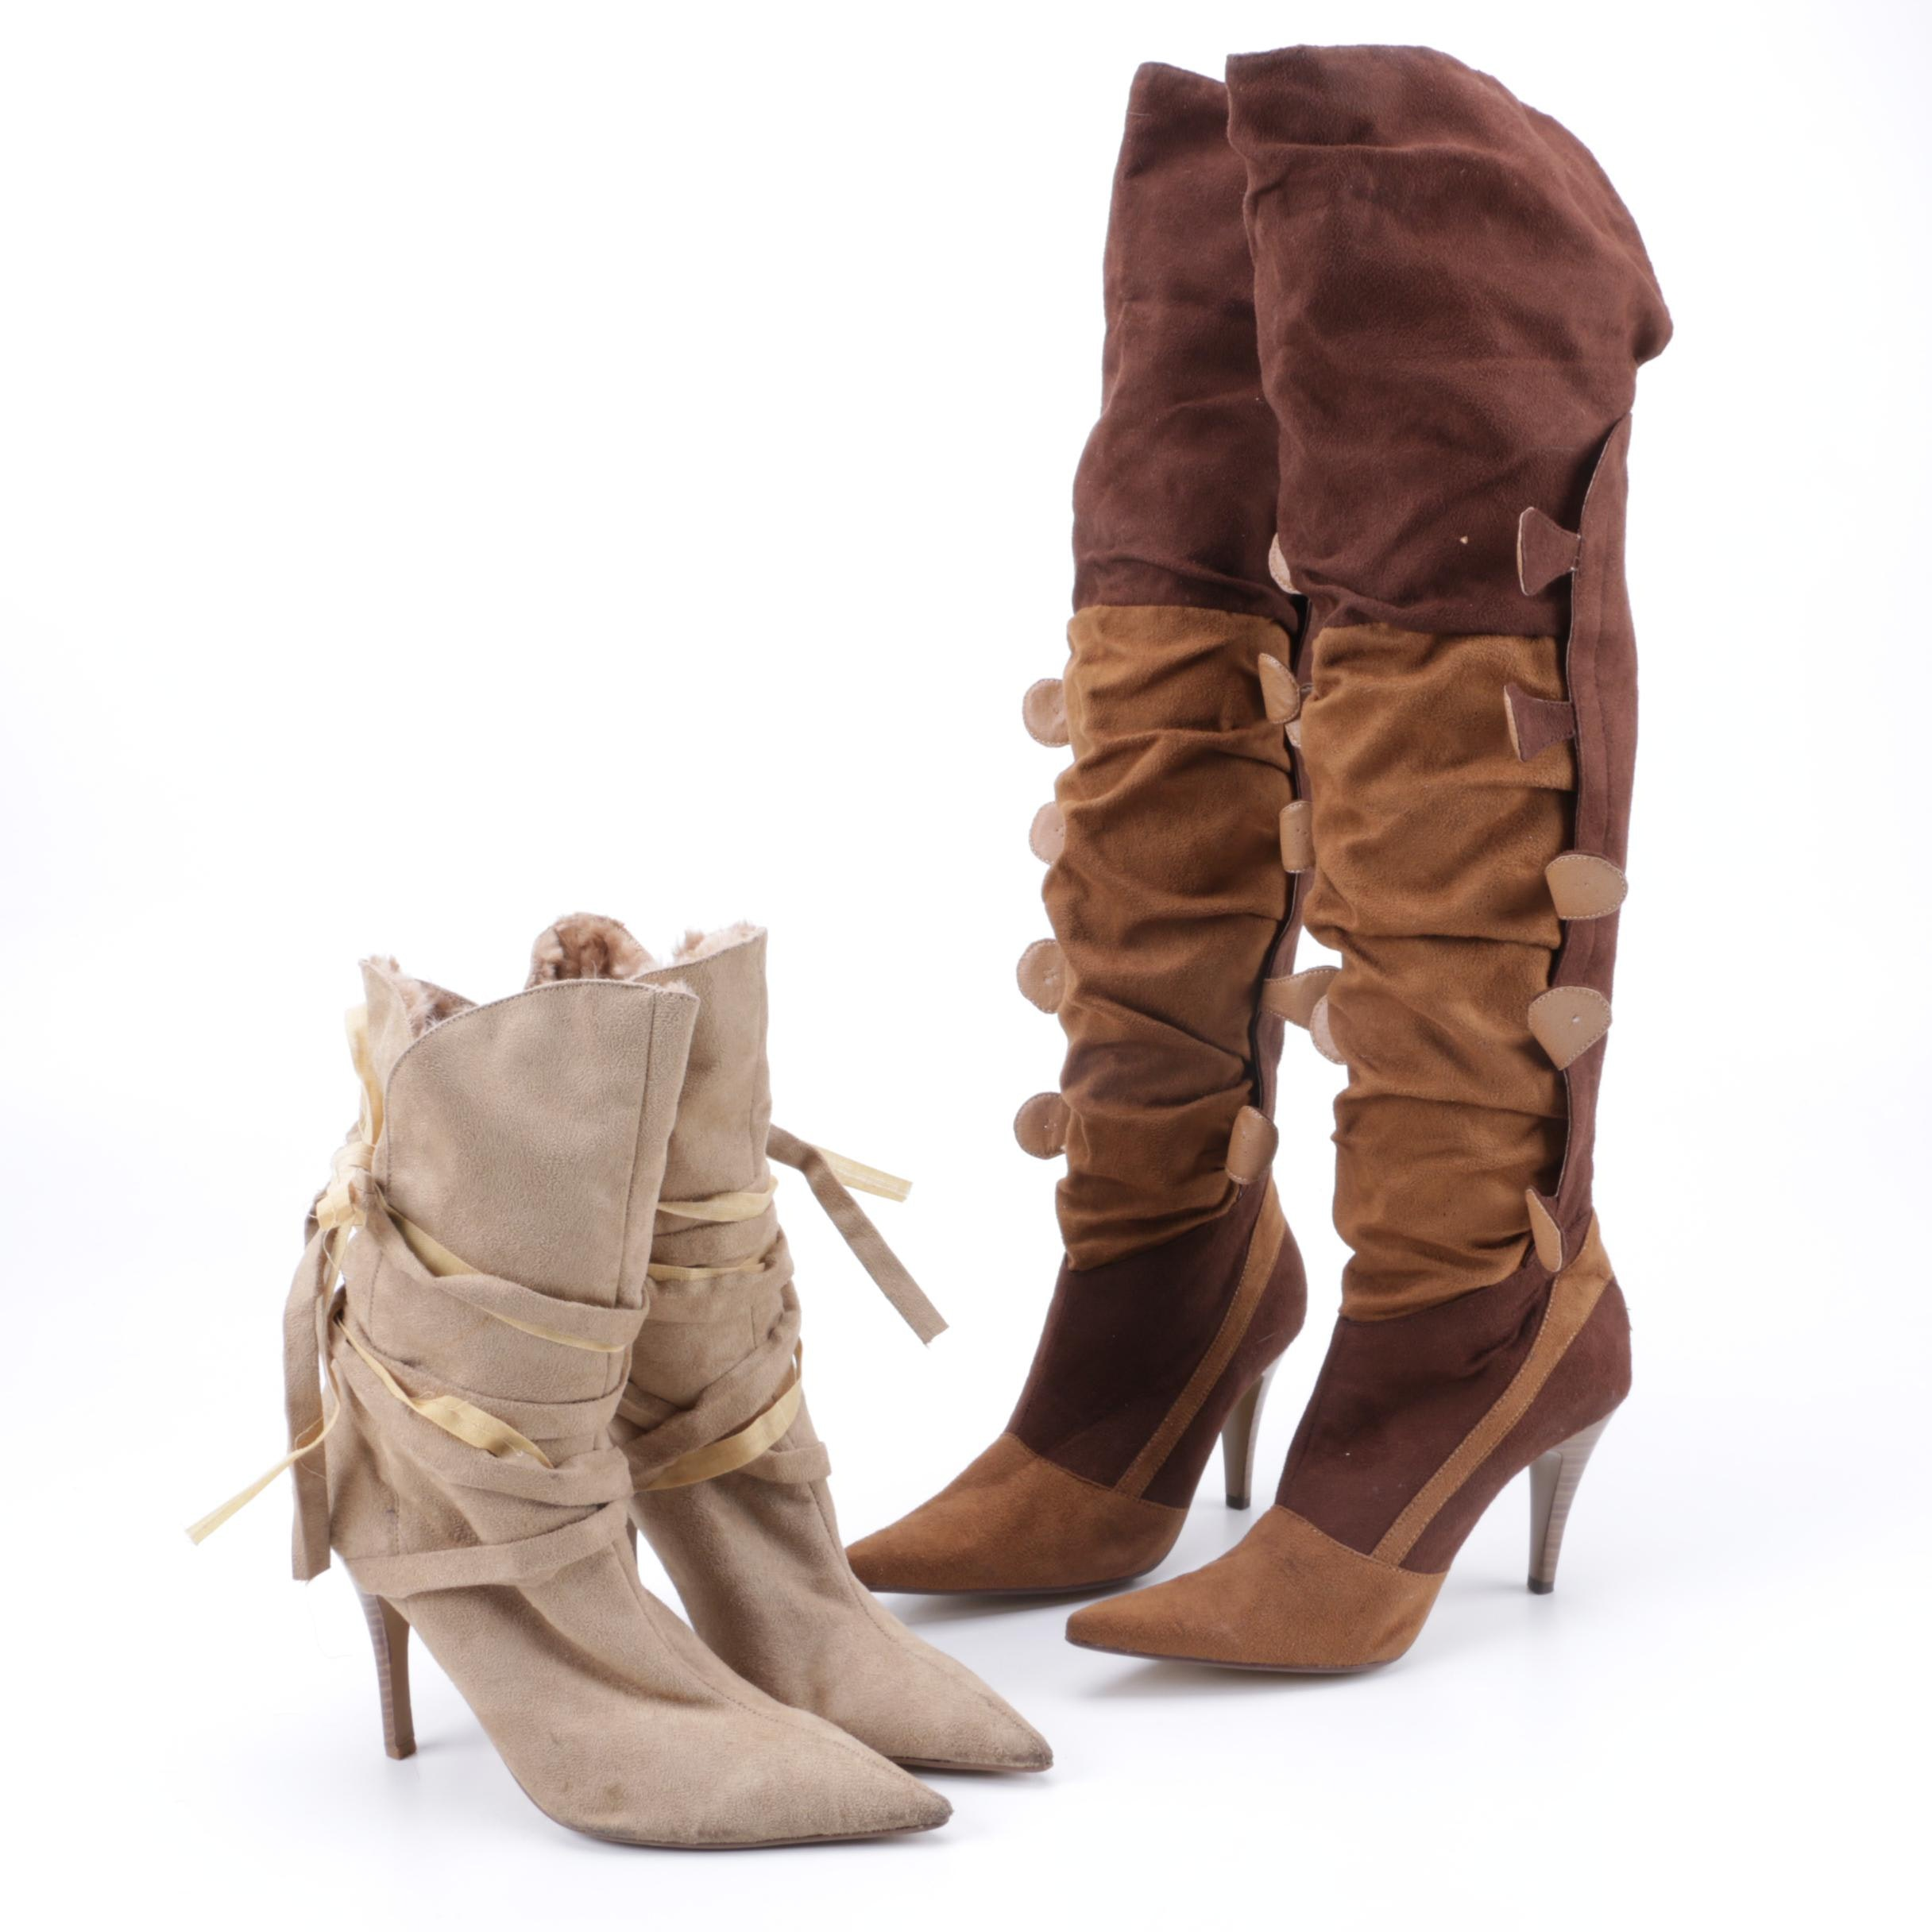 Women's Faux Suede High Heel Boots